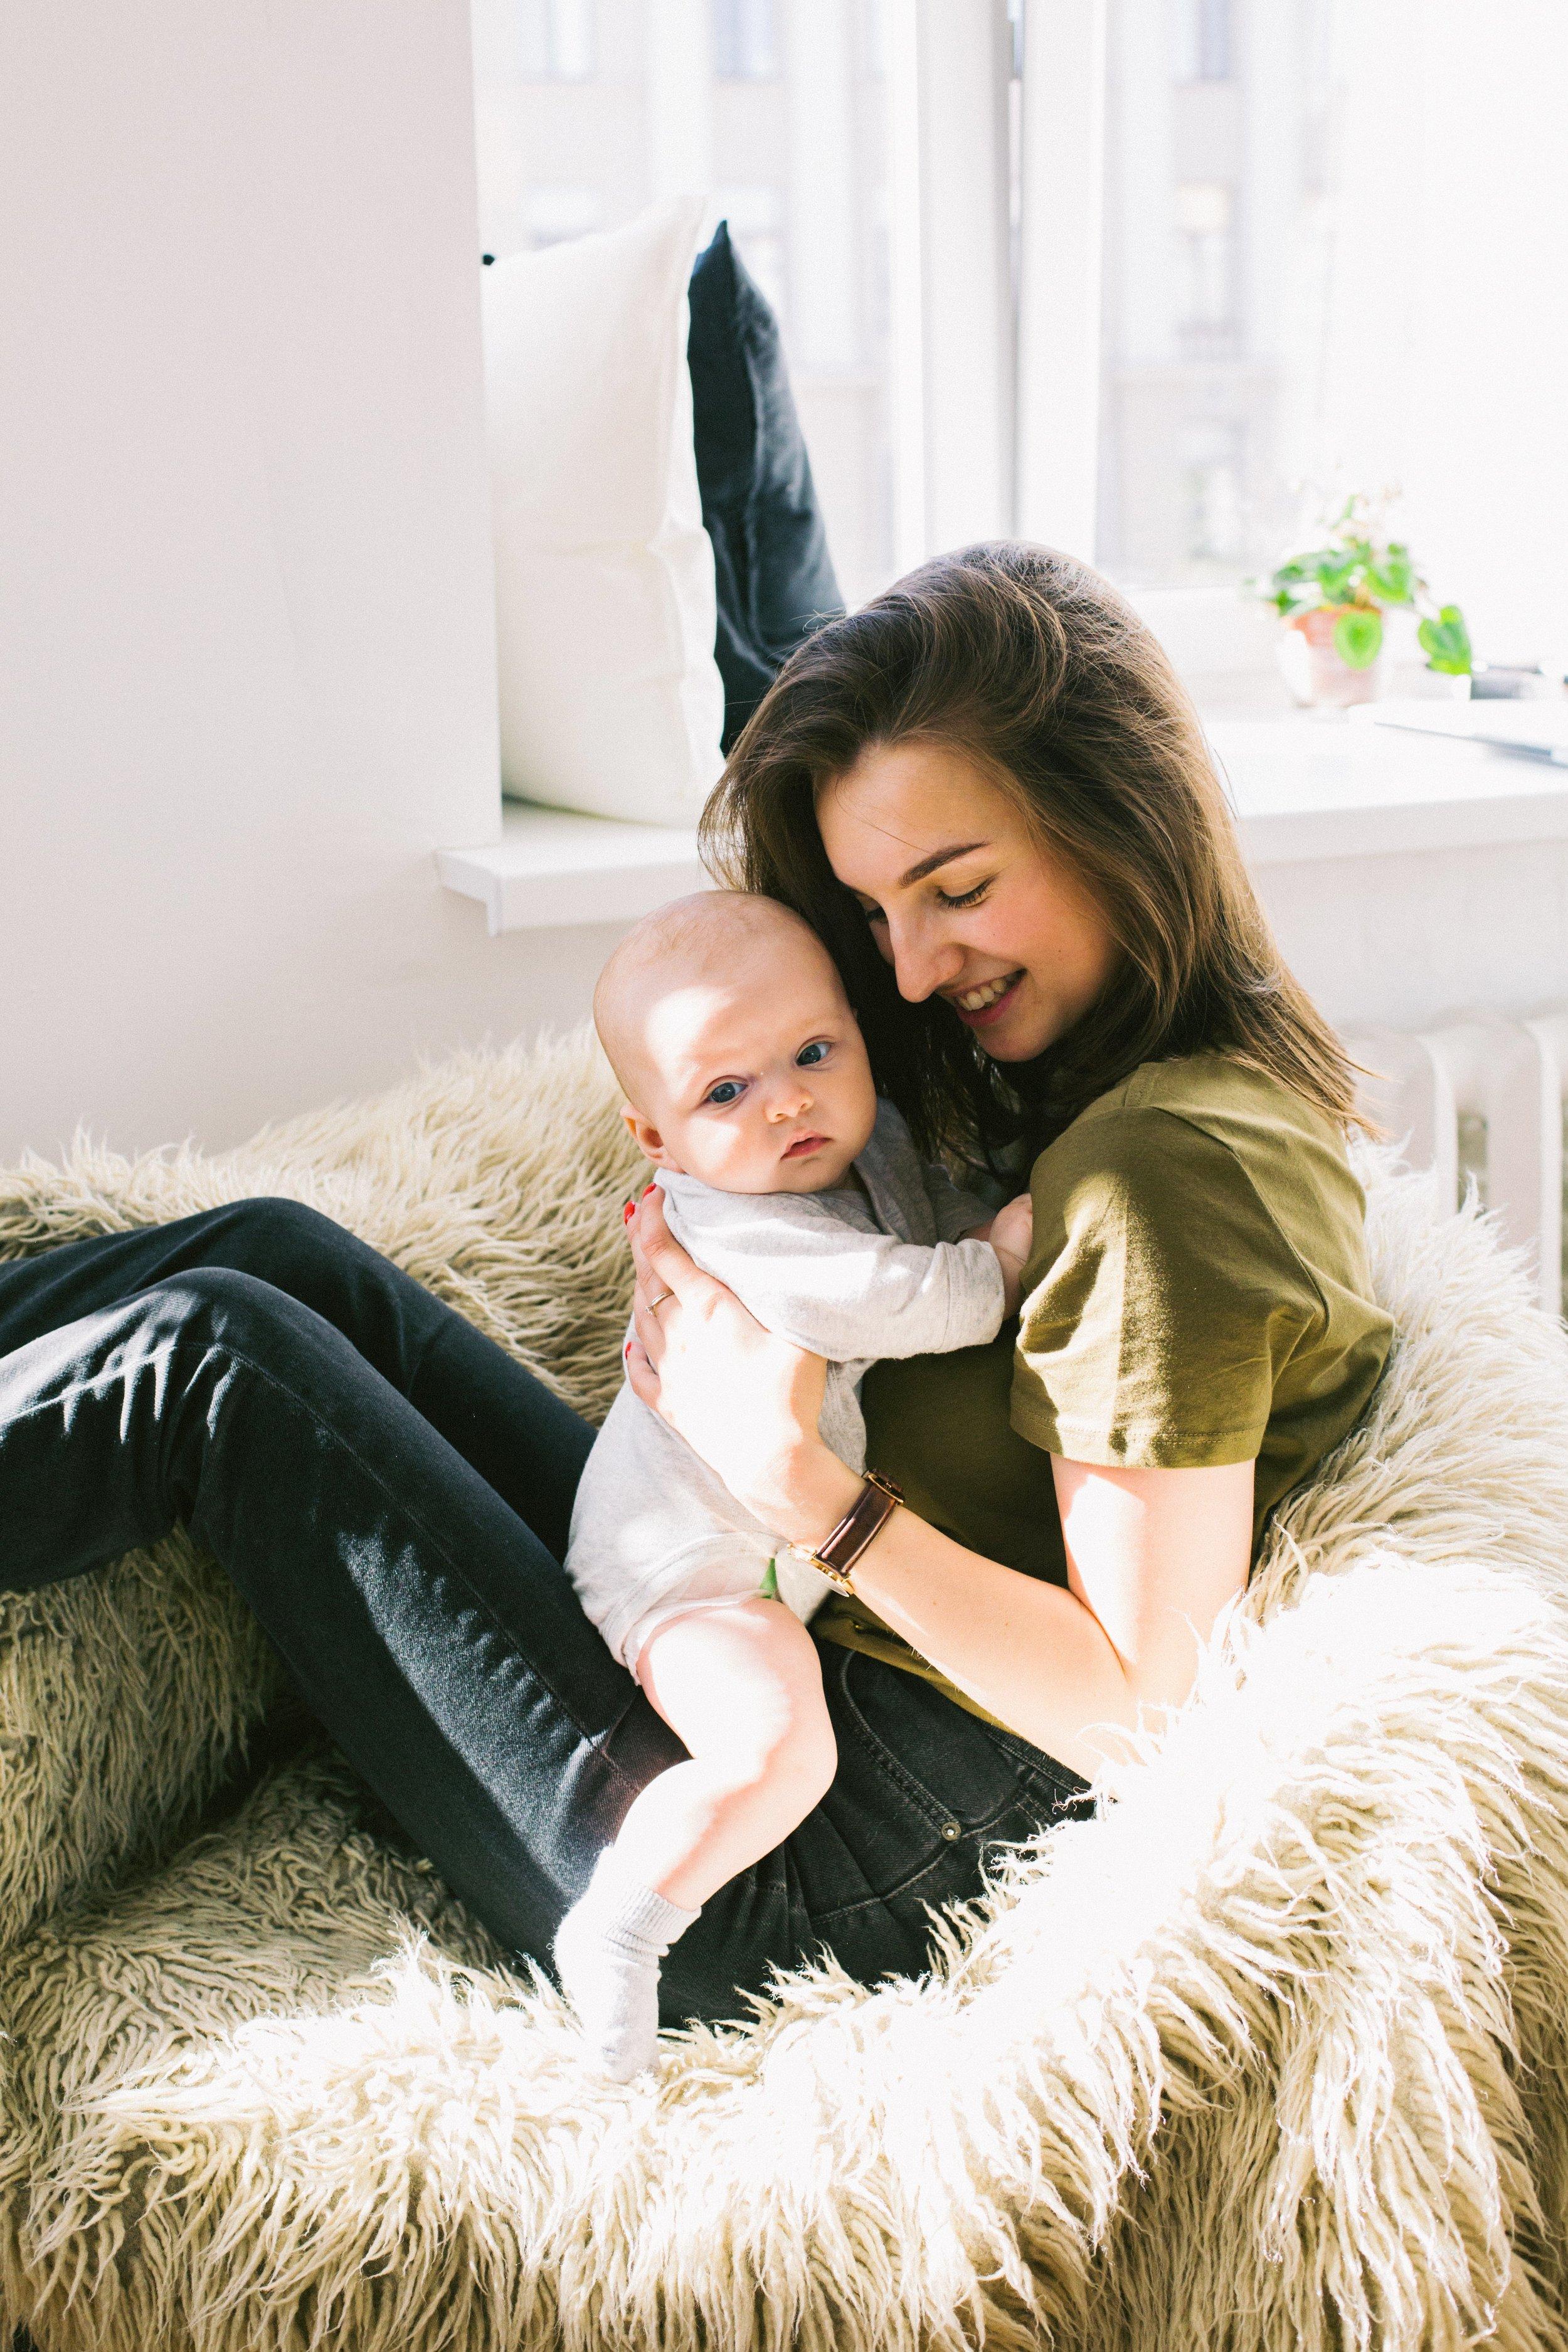 adorable-adult-baby-698877.jpg